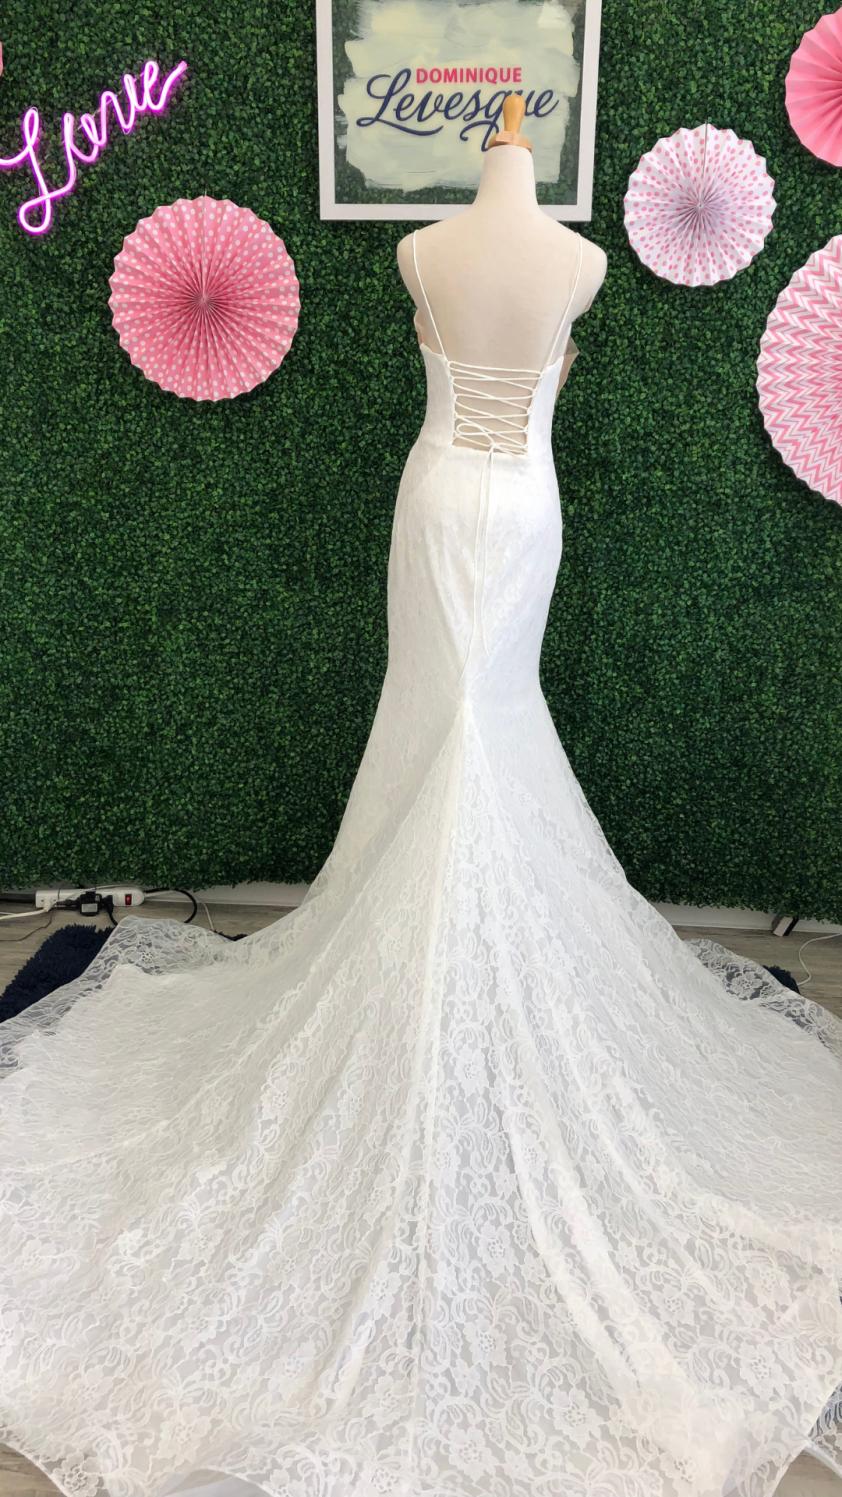 Wedding Dress Laura - Dominique Levesque Bridal